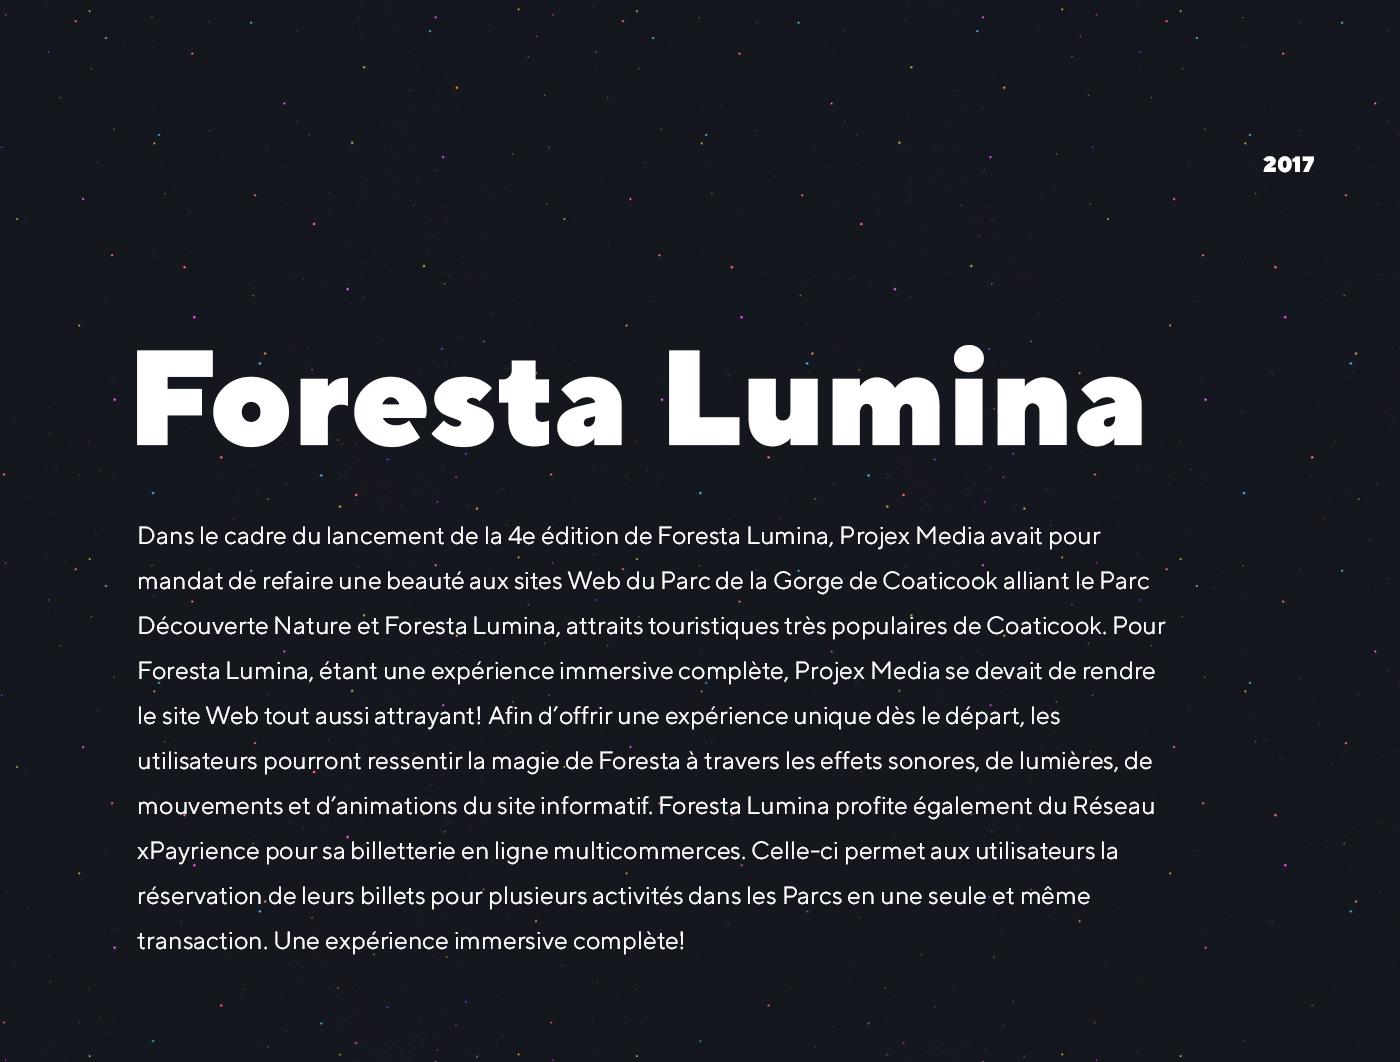 Foresta Lumina - Site Web informatif et billetterie xPayrience - Réalisation signée Projex Media